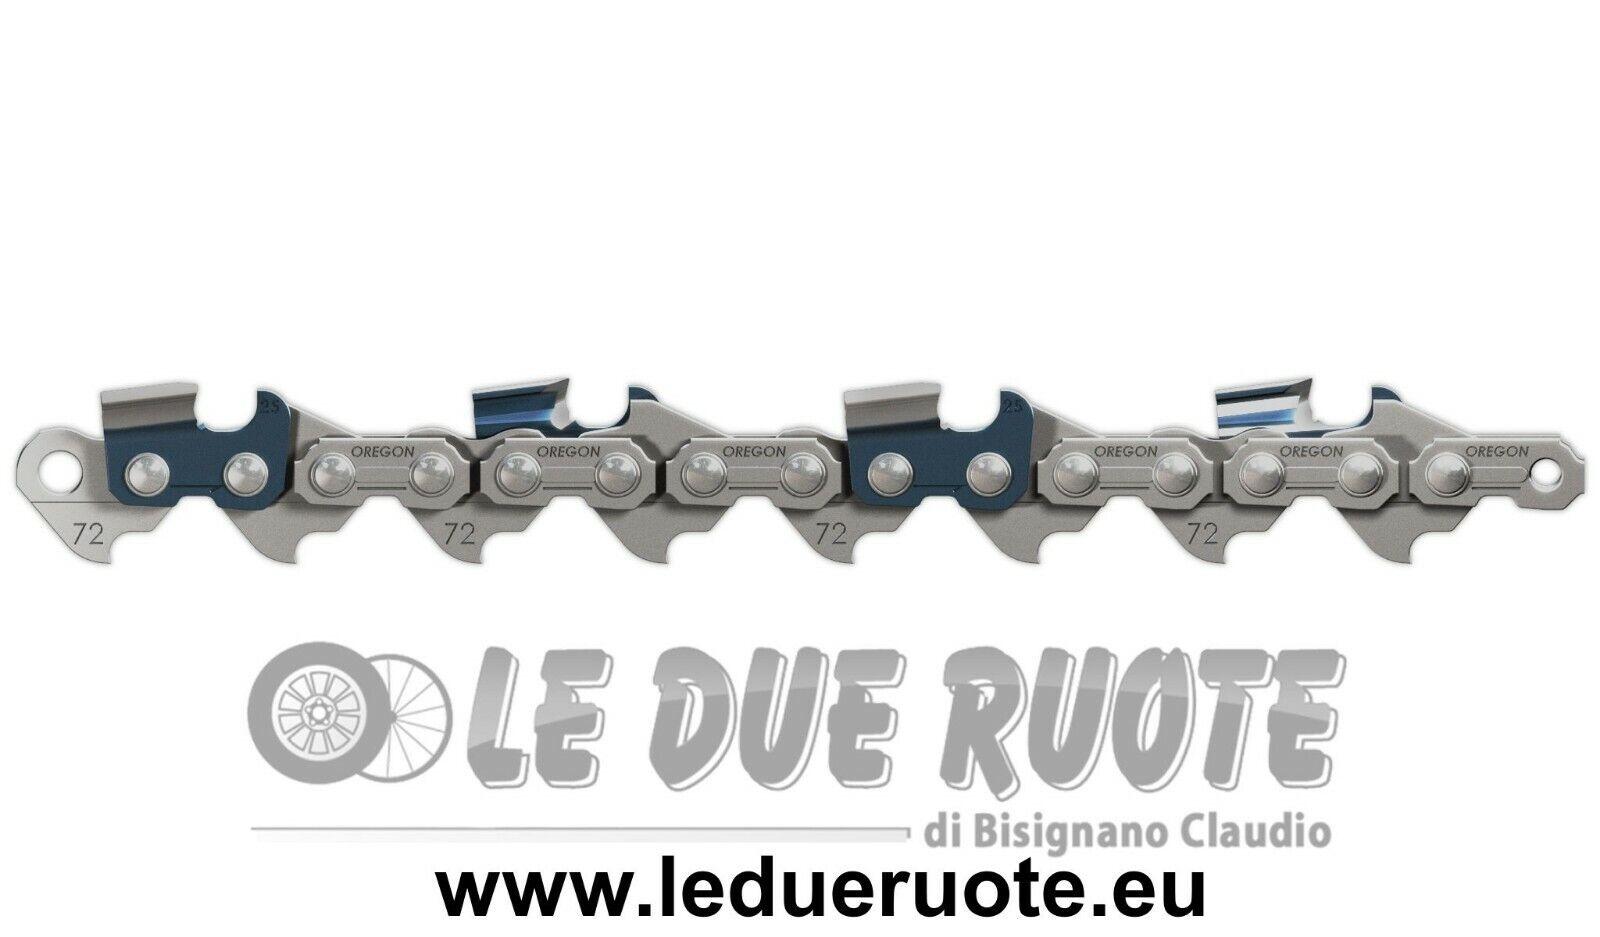 Cadena Motosierra Oregon alpina Prof - 700 Bar 55 60 cm 3 8  75DPX